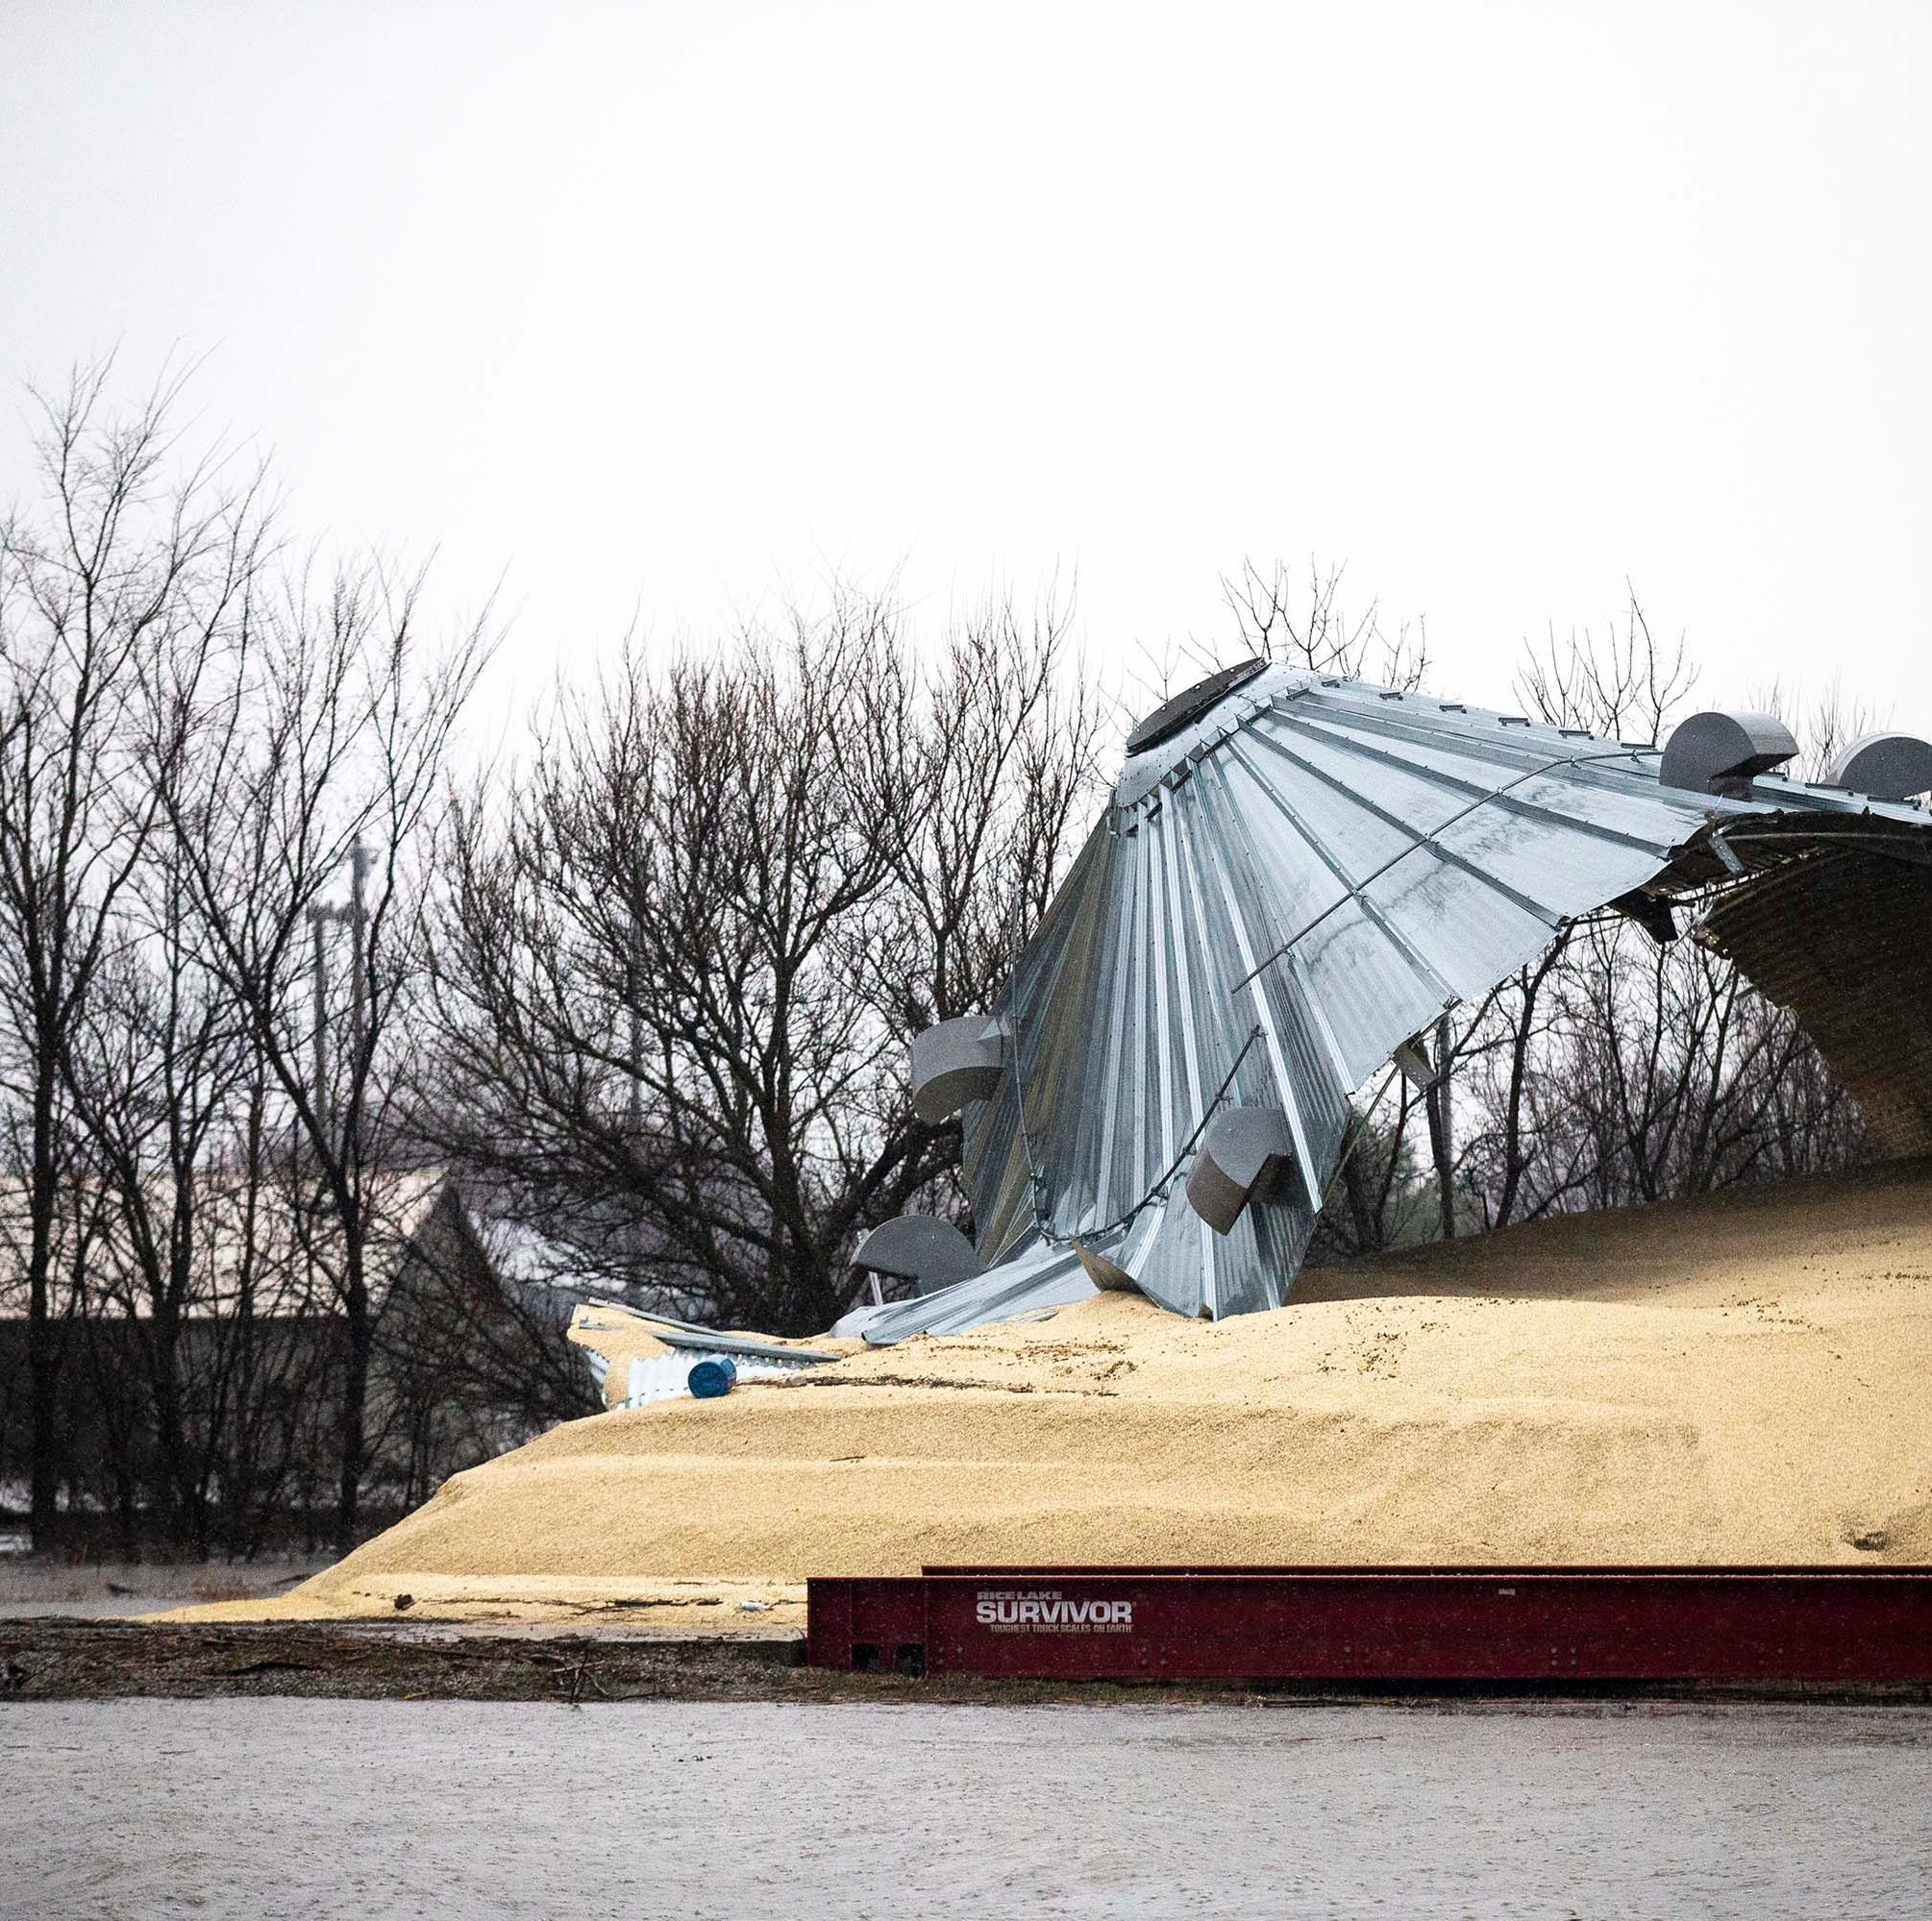 Farm losses drive Iowa's flood damage to $2 billion, Farm Bureau economists estimate